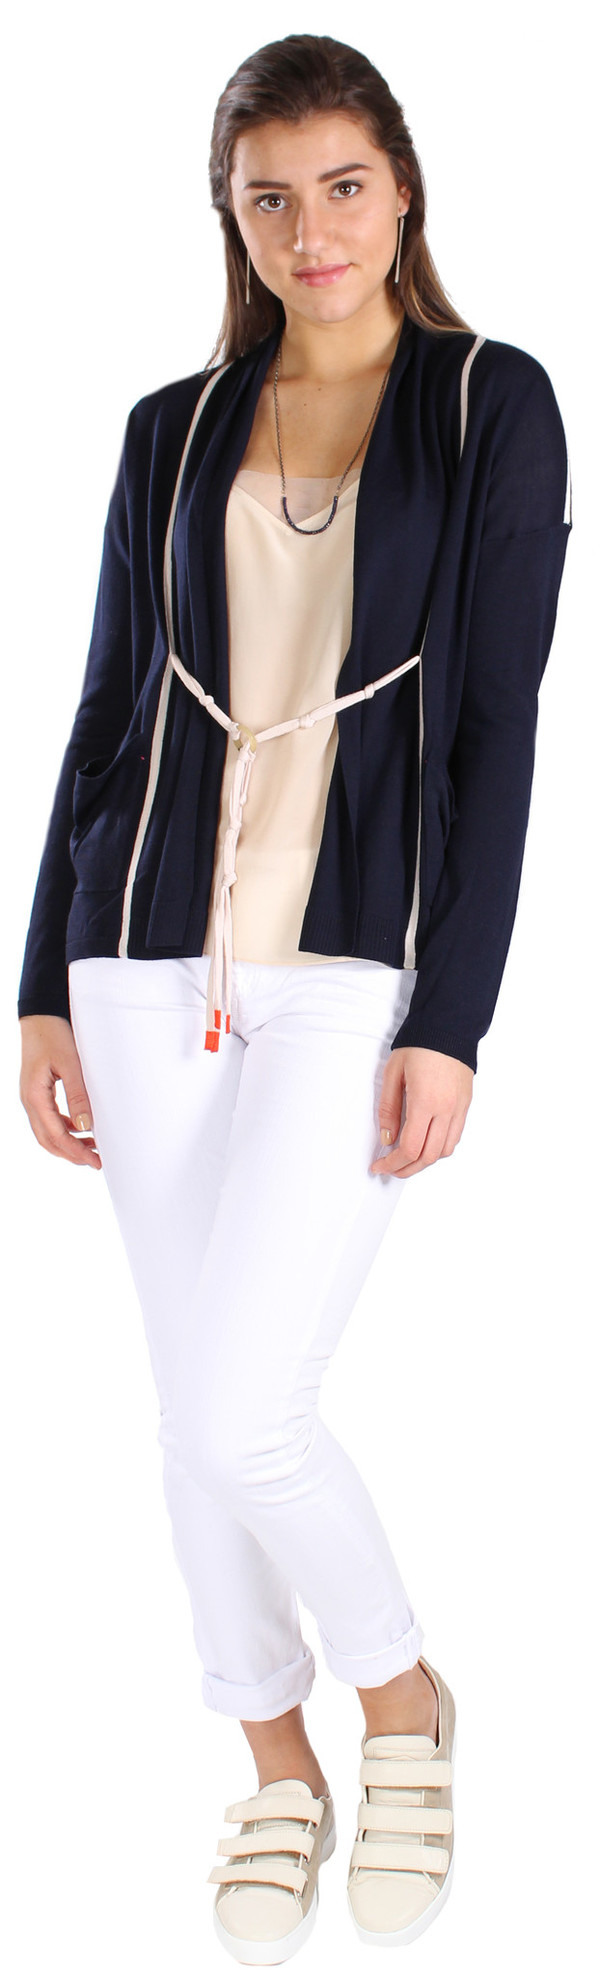 Label+Thread Ring Tie Cardigan